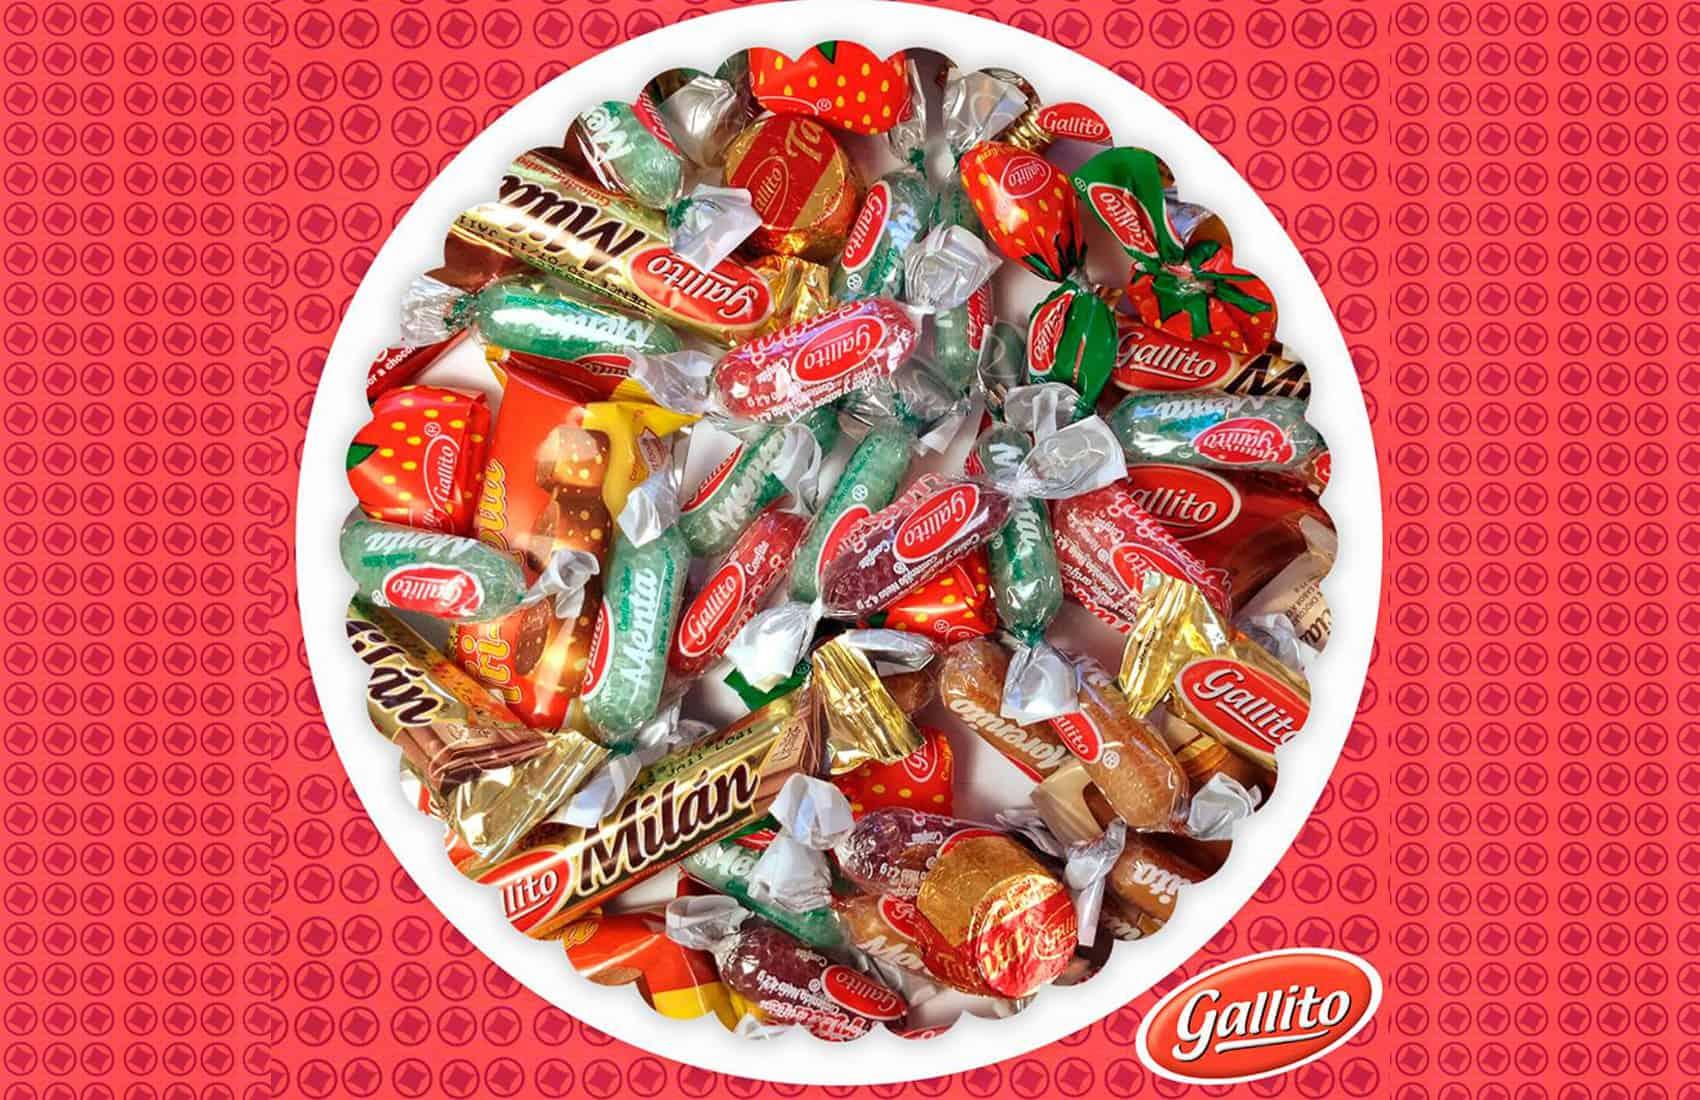 Gallito candies and chocolates